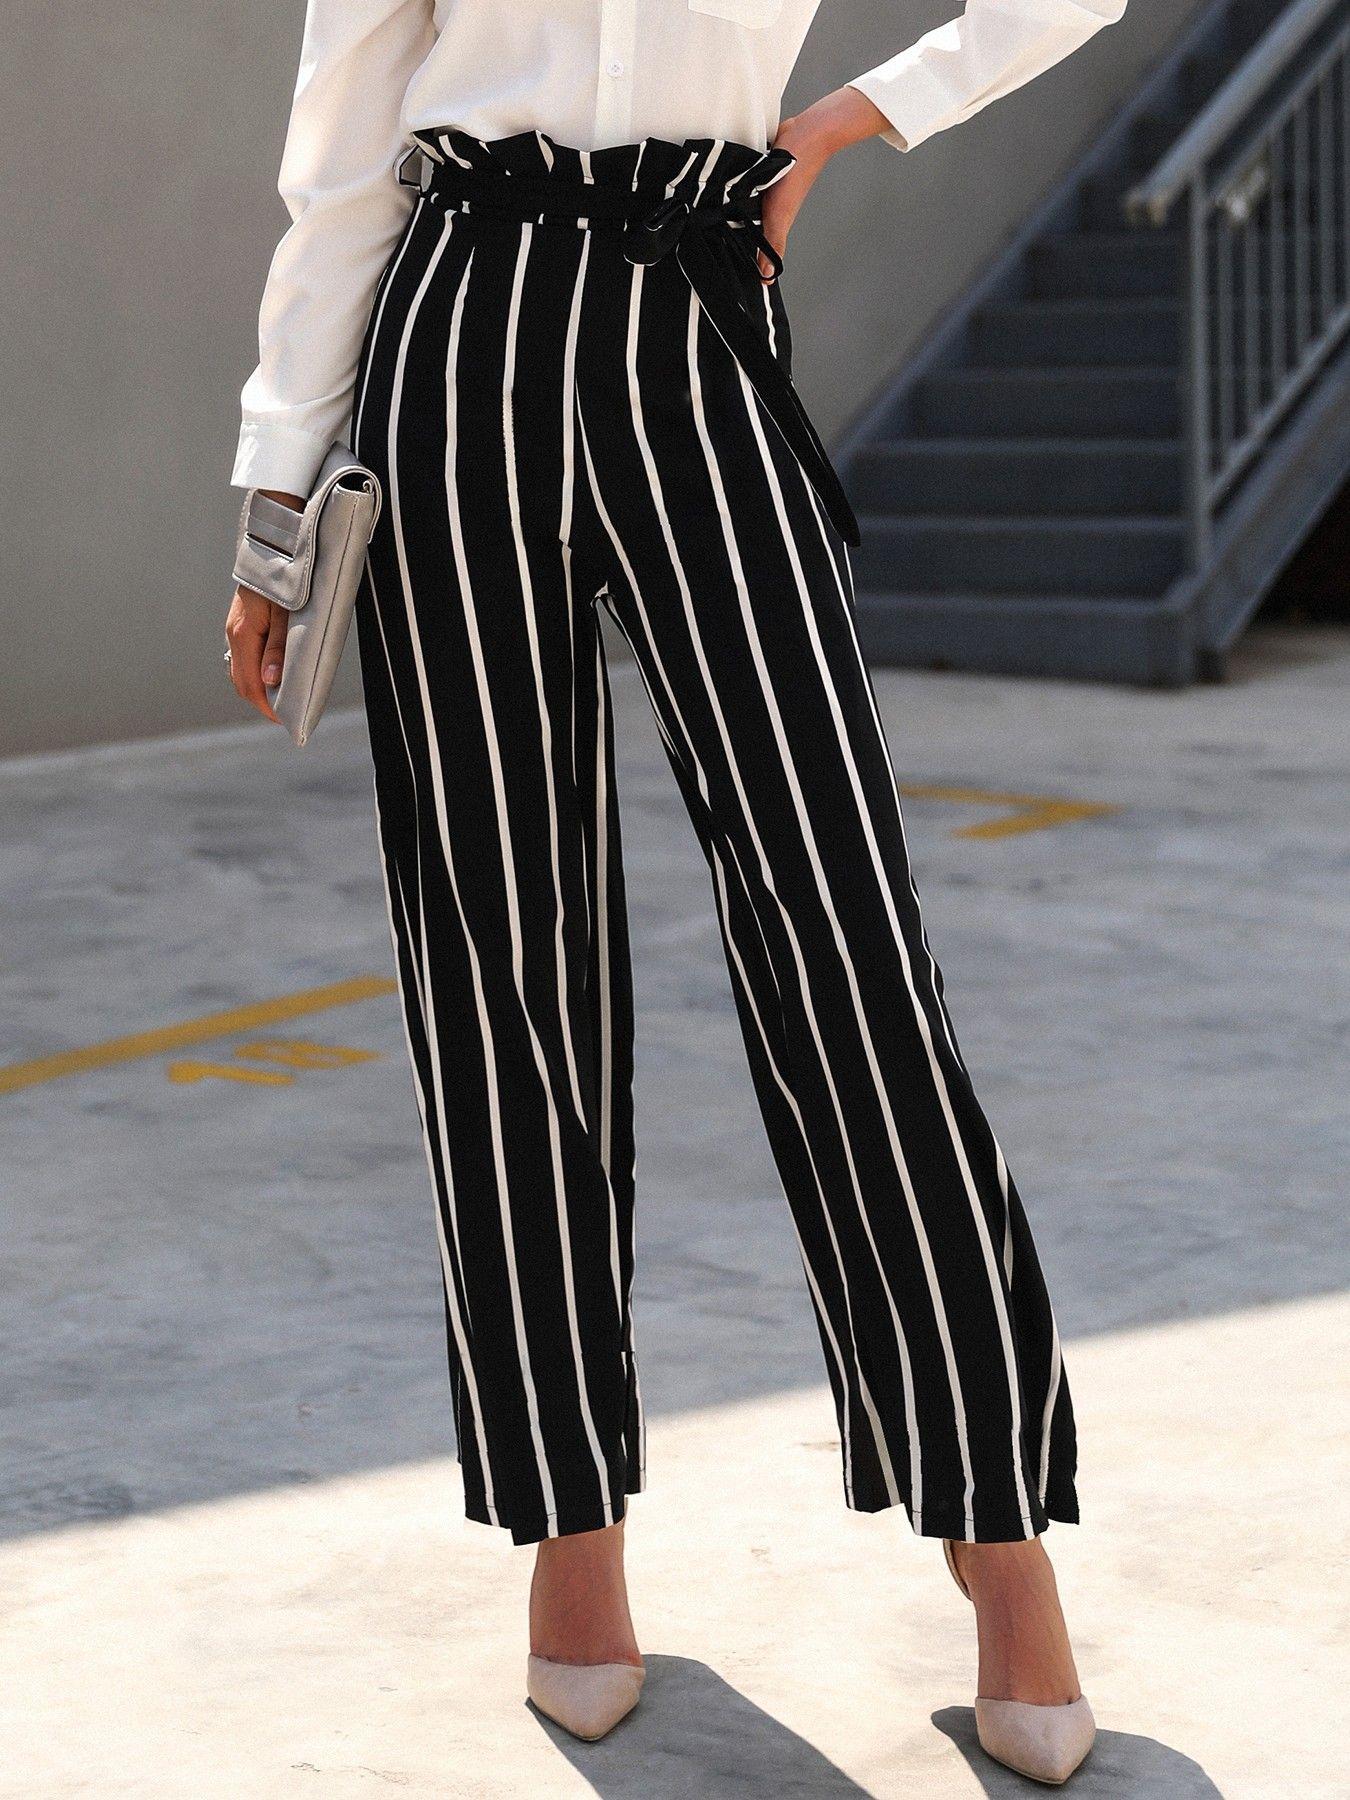 Ladies Womens Linen Trousers Black Wide Legs Regular Fit Frill Trim Pant